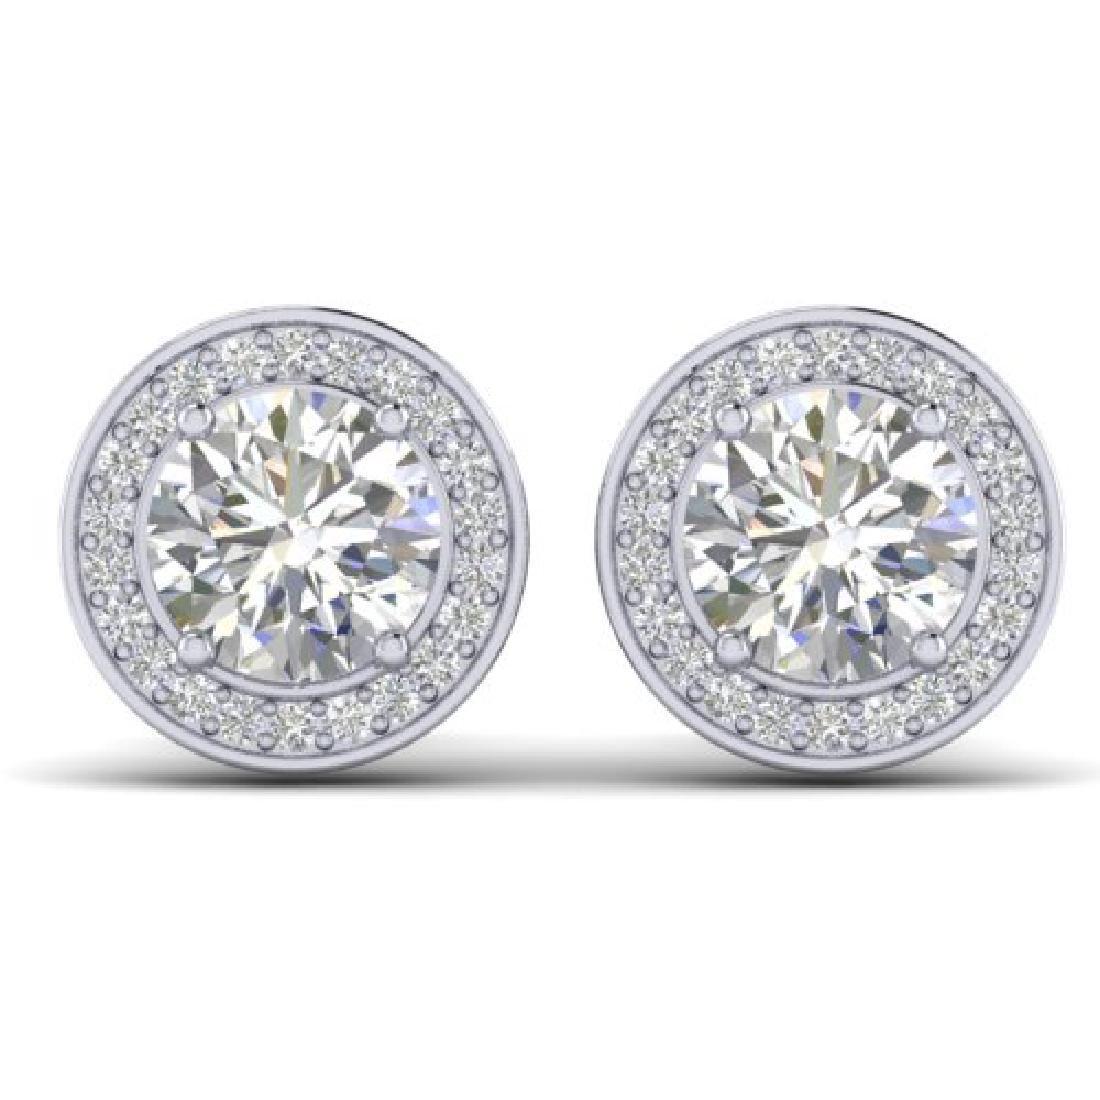 1.85 CTW I-SI Diamond Solitaire Art Deco Micro Stud